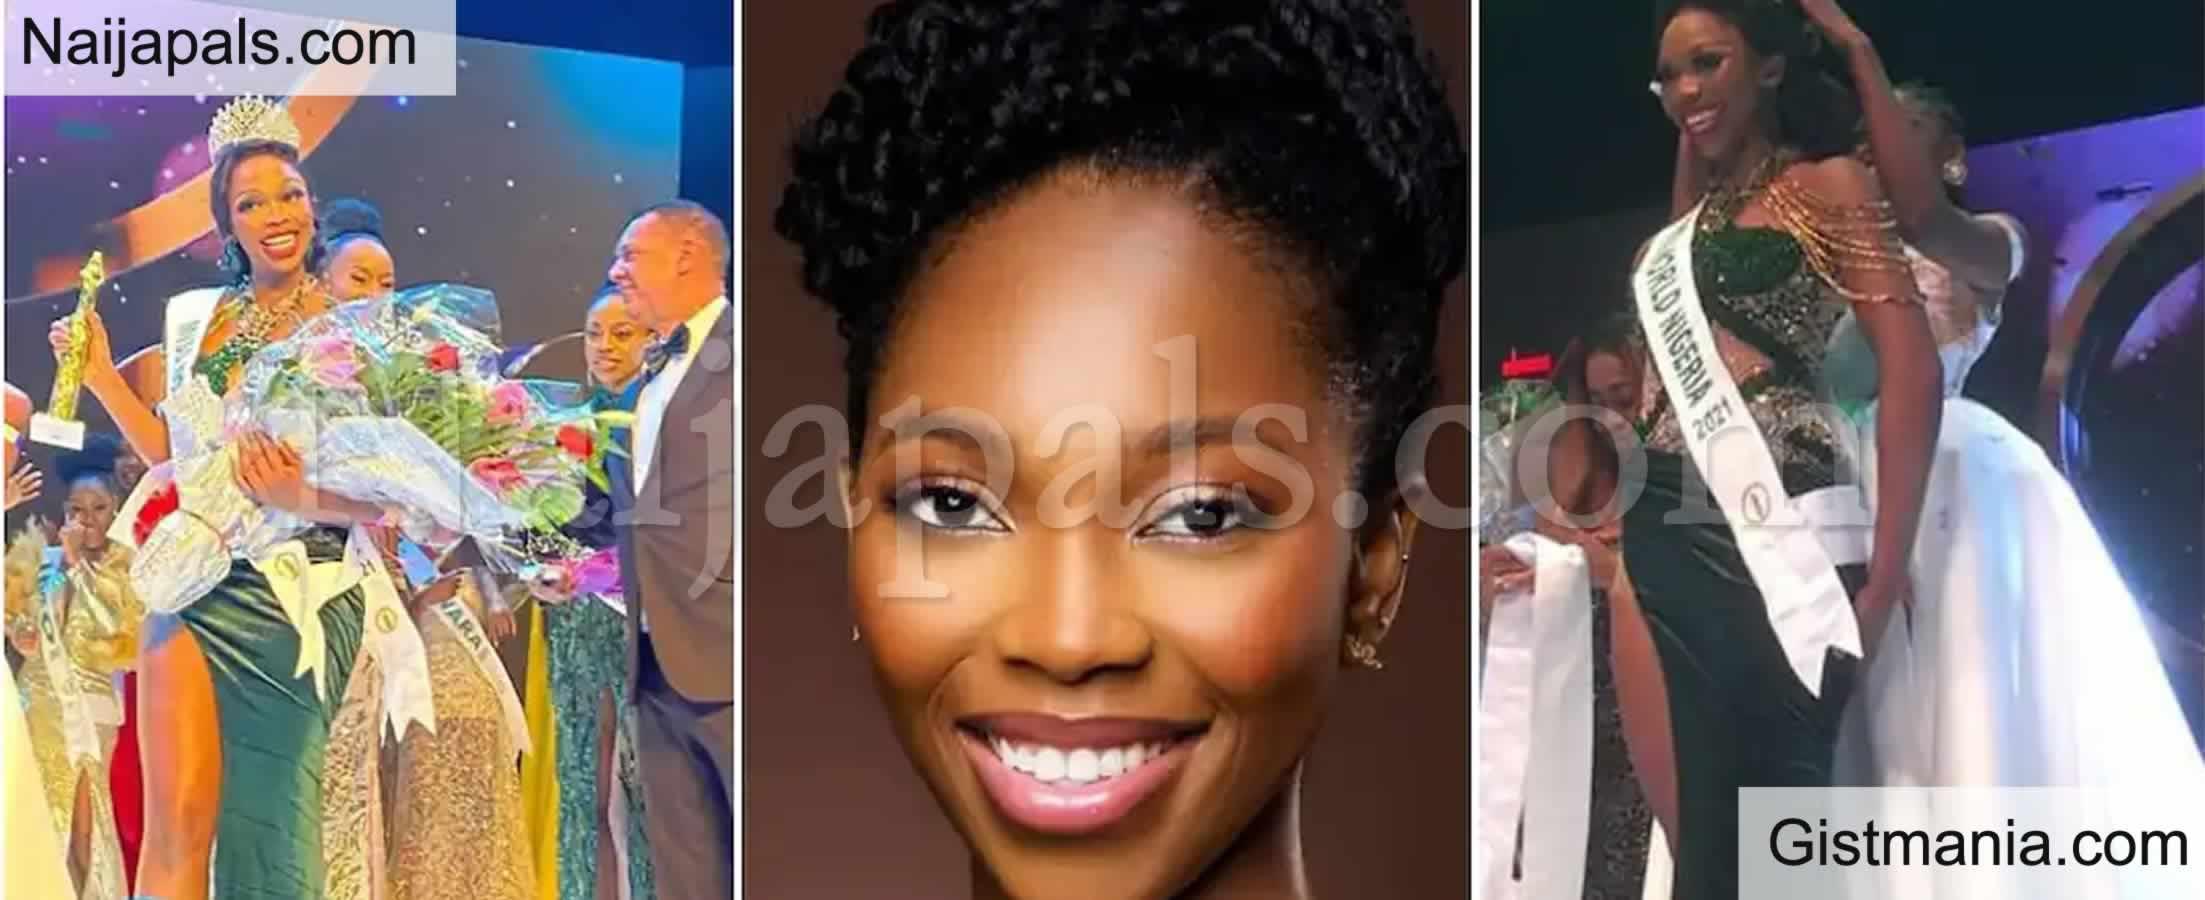 <img alt='.' class='lazyload' data-src='https://img.gistmania.com/emot/video.gif' /> VIDEO: <b>Introducing Oluchi Madubuike The Most Beautiful Girl in Nigeria 2021</b>